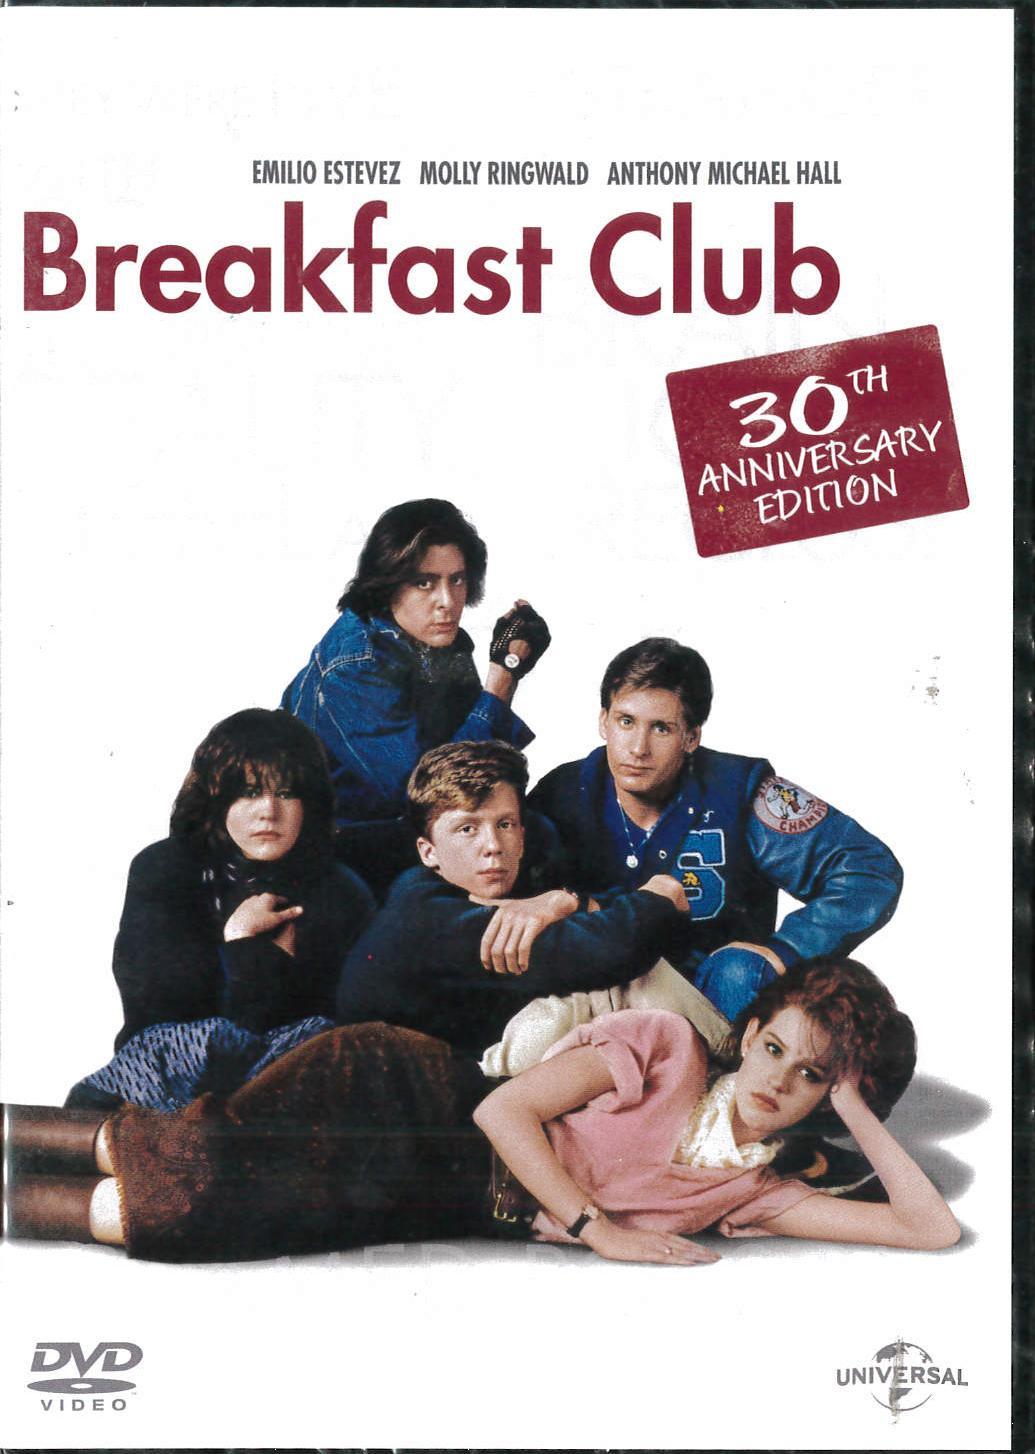 BREAKFAST CLUB (S.E) 30 ANNIVERSARY (DVD)